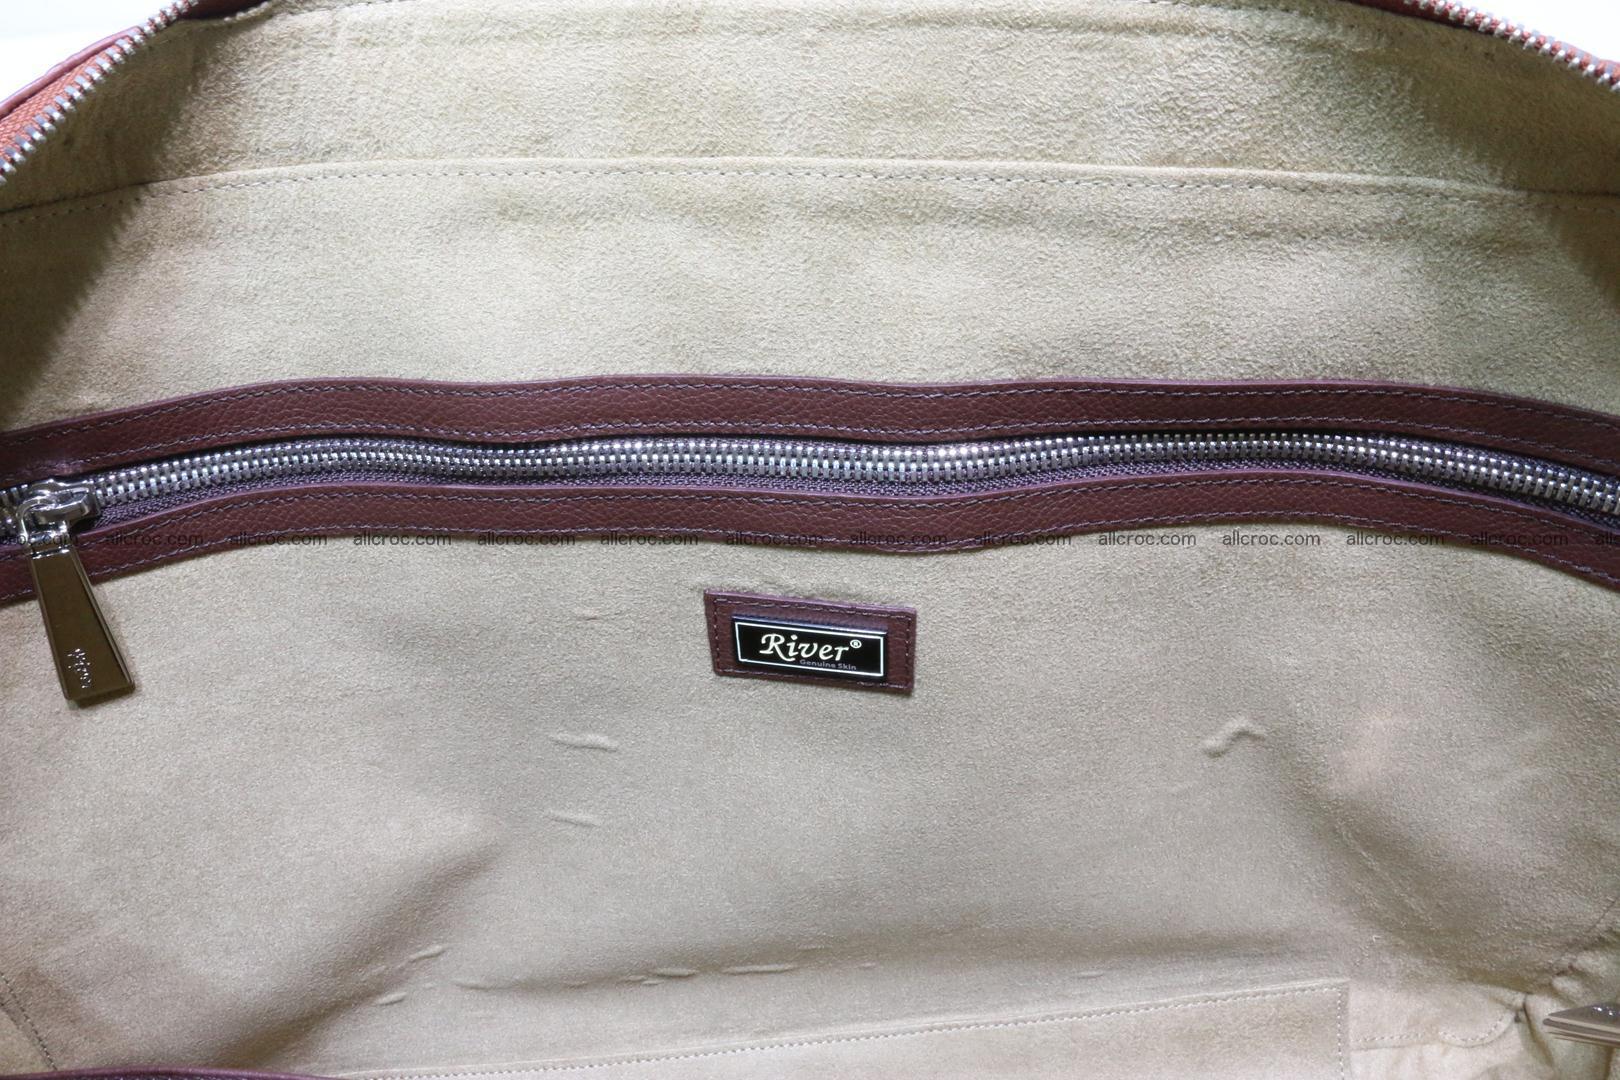 Crocodile skin handbag 125 Foto 14